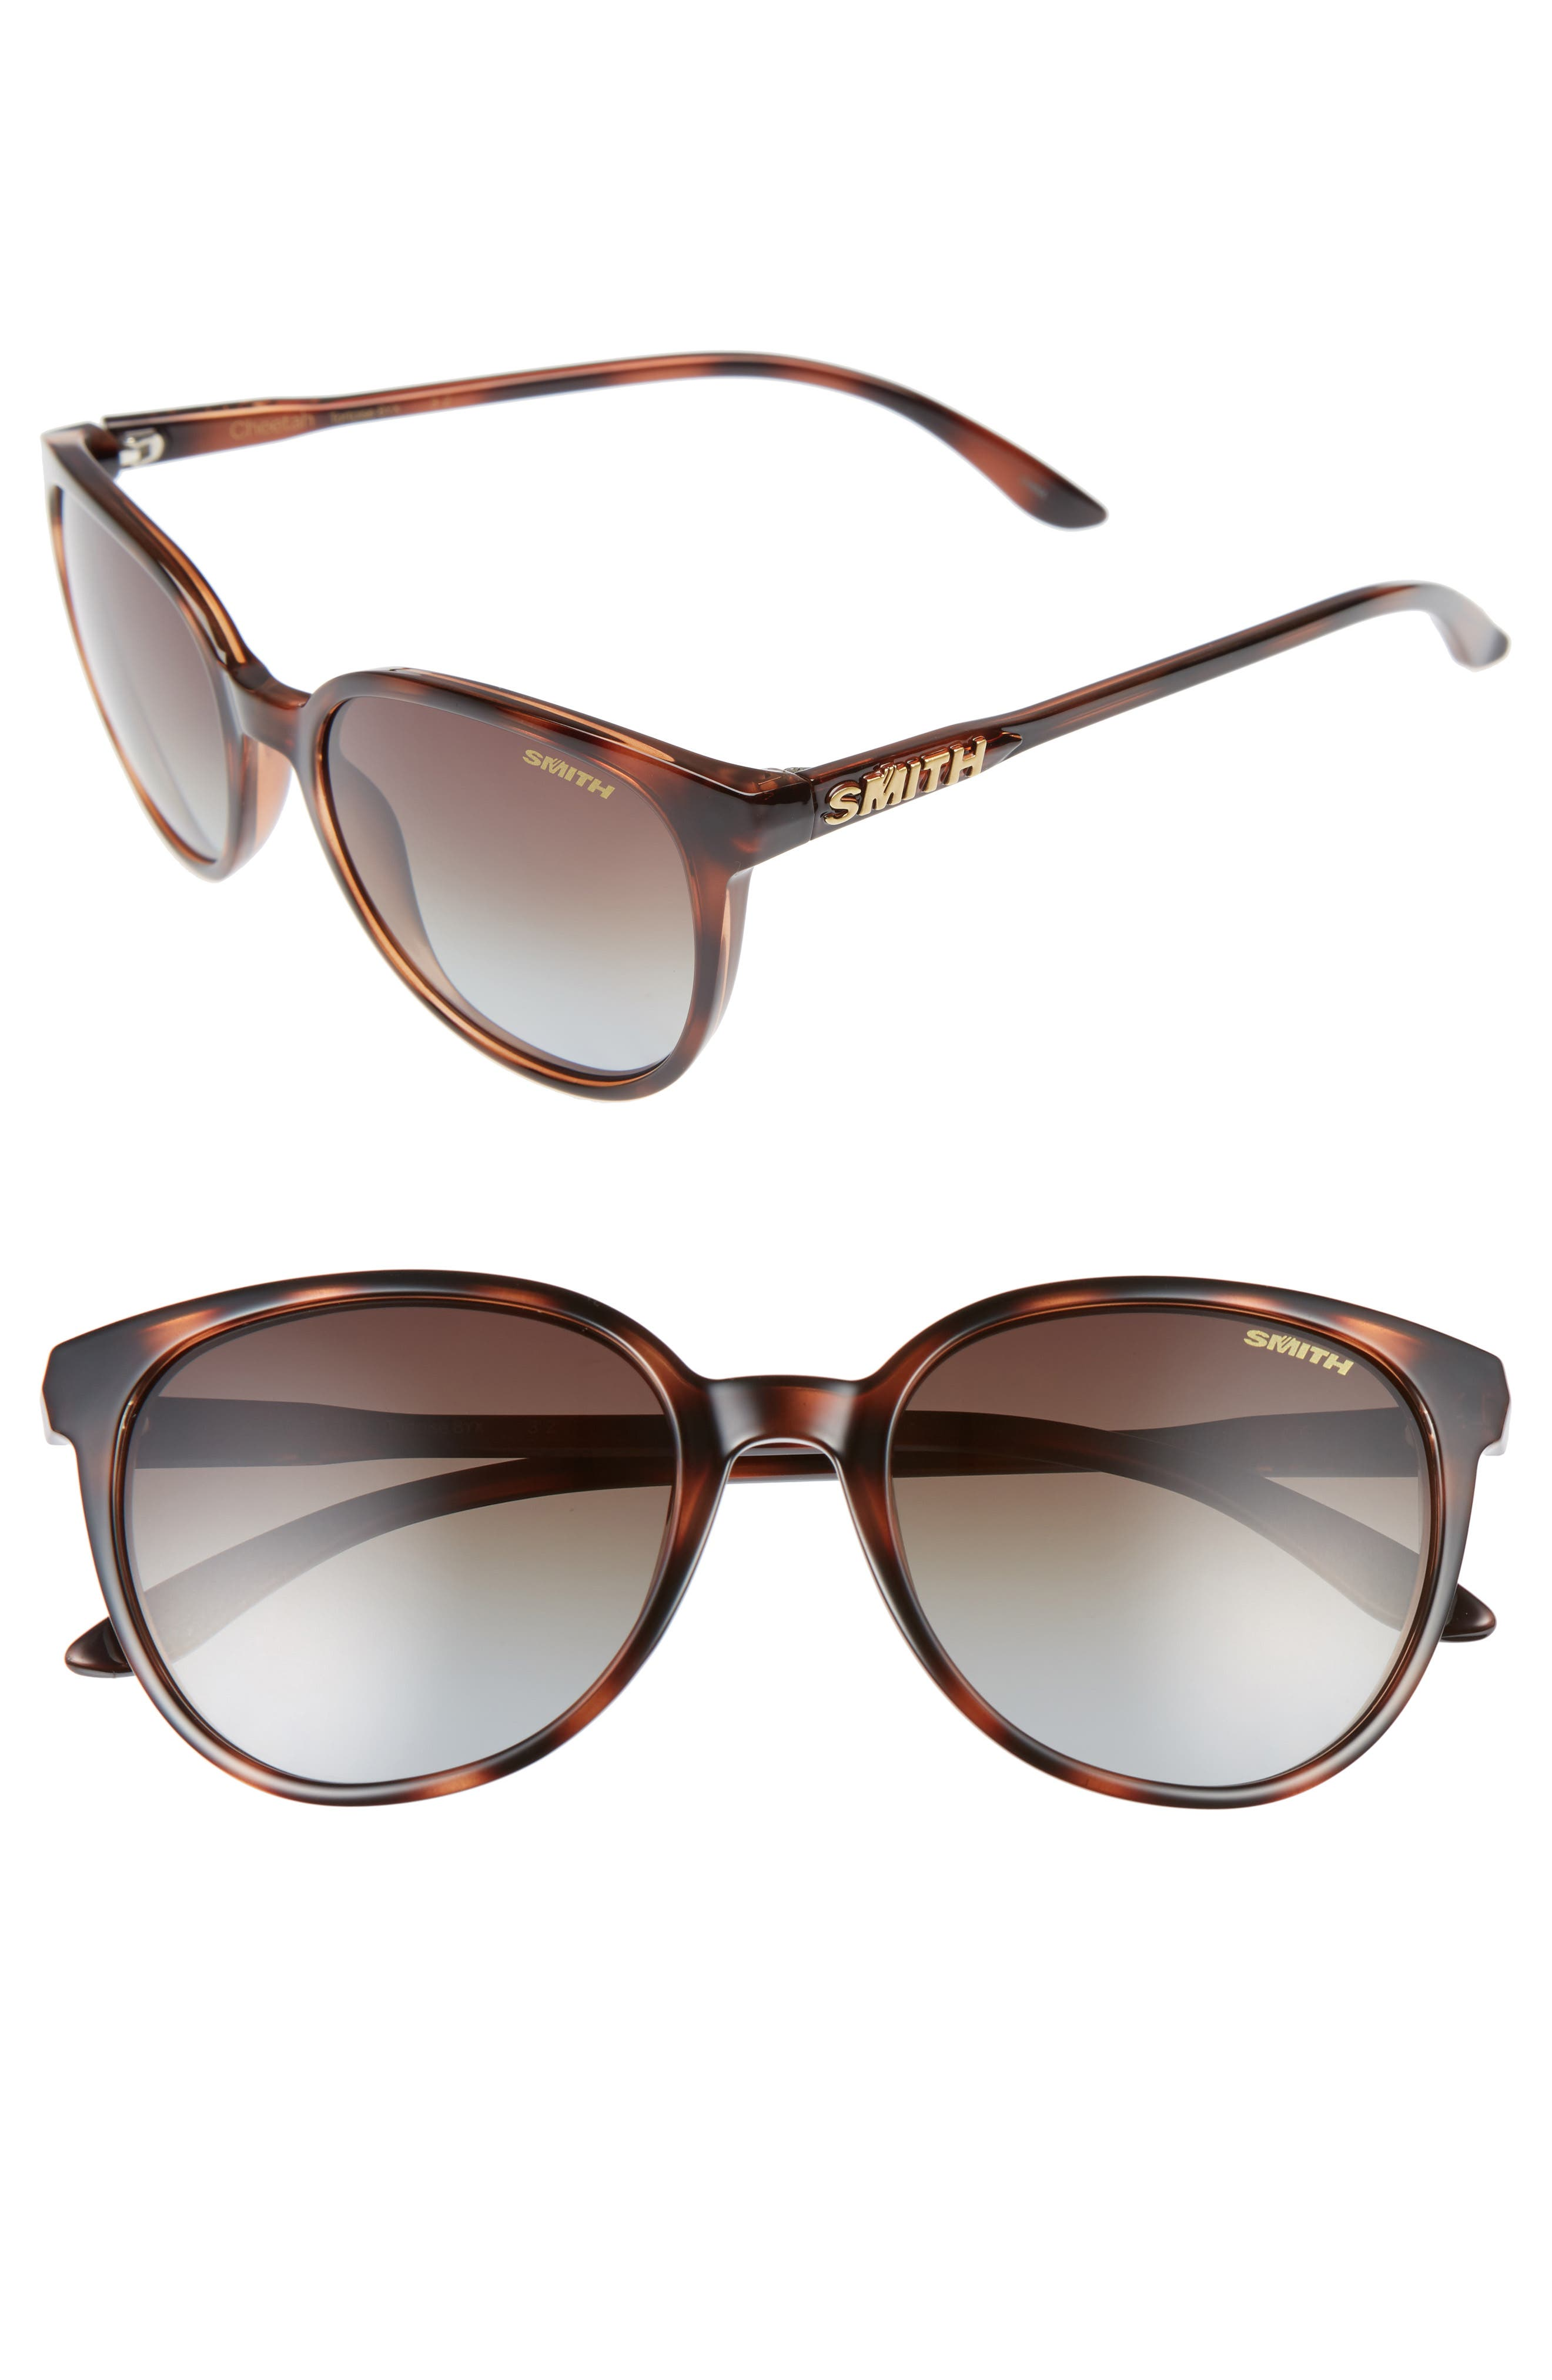 Cheetah 54mm Polarized Sunglasses,                             Main thumbnail 1, color,                             TORTOISE